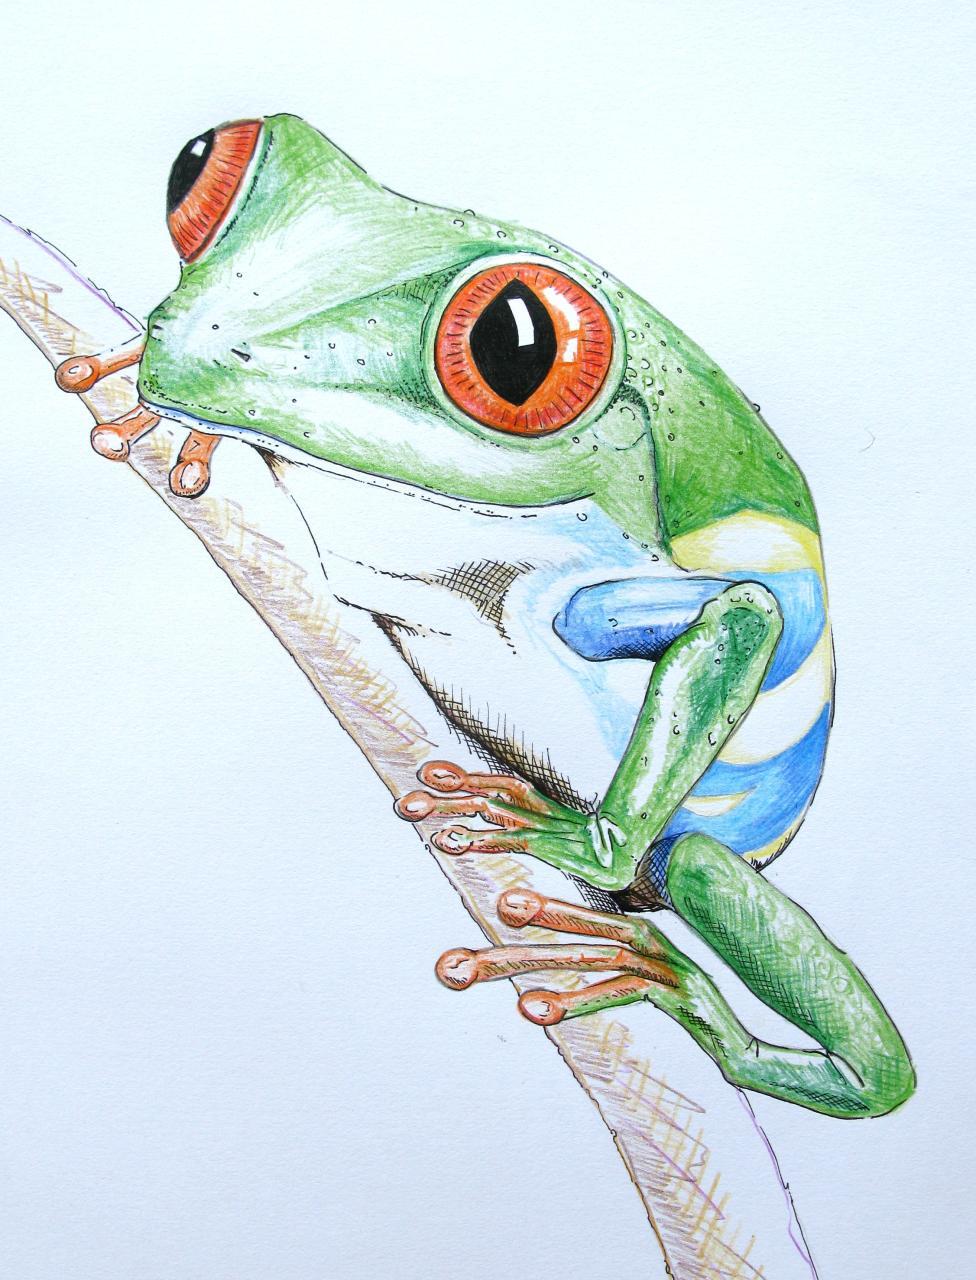 tree frog drawing 5958910255 506a5144e6 o jpg